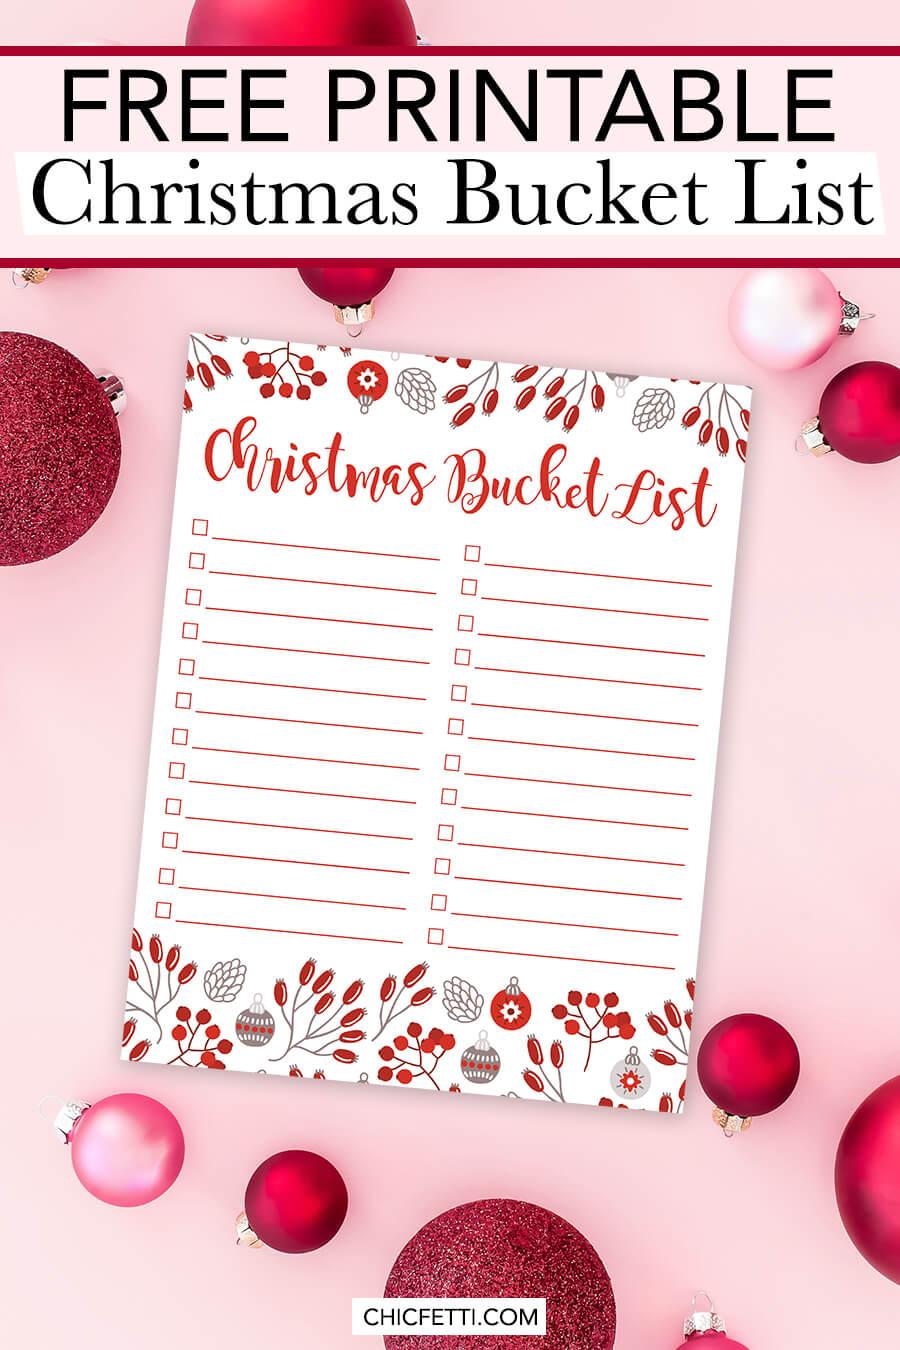 Make your own Christmas bucket list with this free printable Christmas bucket list - just download and fill it out with your own bucket list items #christmas #christmasideas #christmasbucketlist #holidaybucketlist #freeprintable #printable